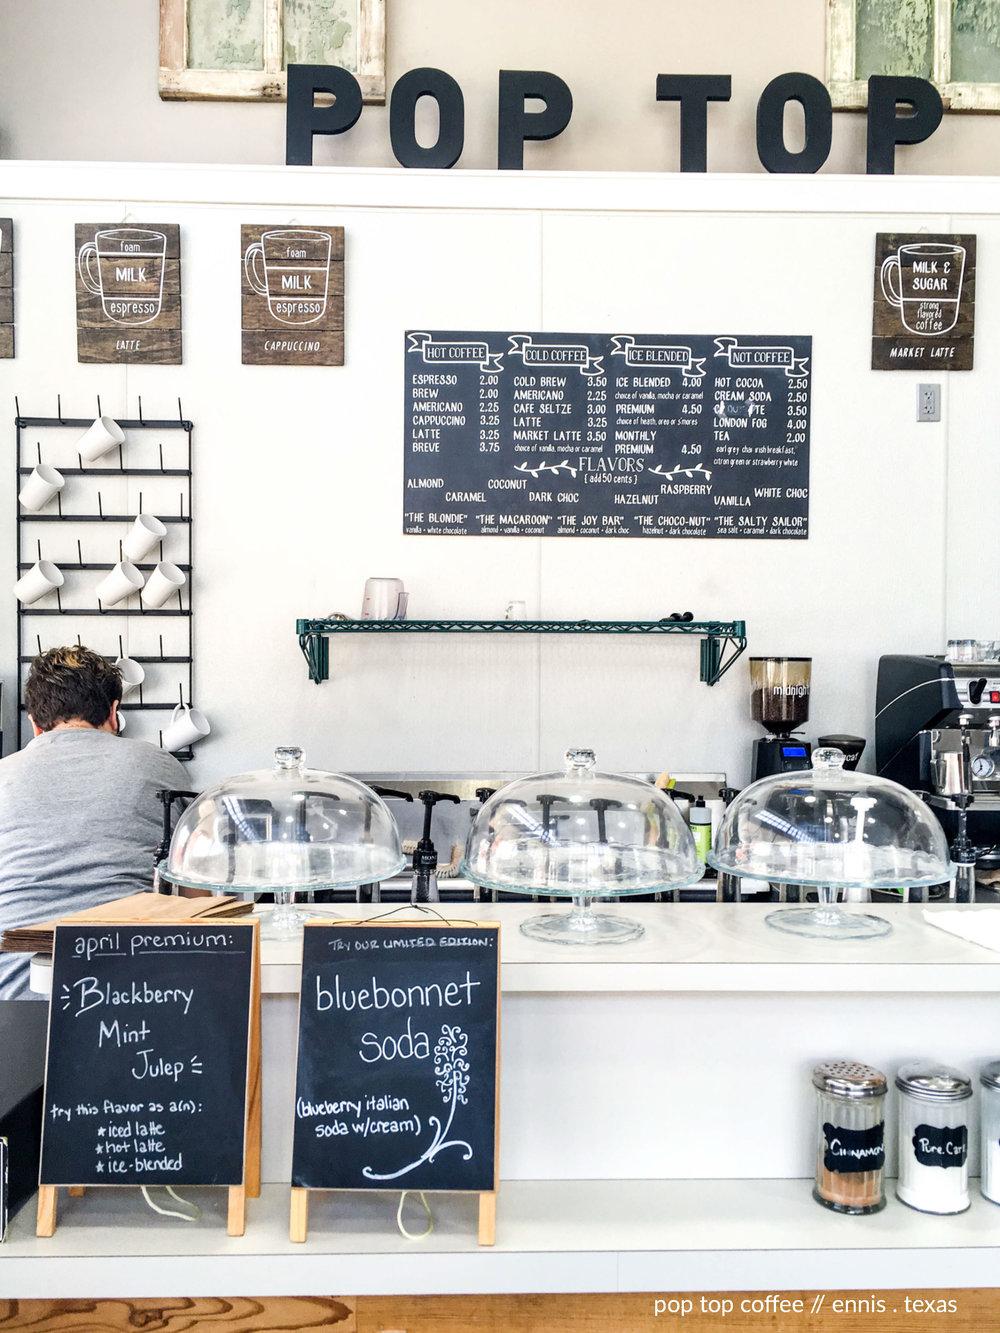 poptopcoffee